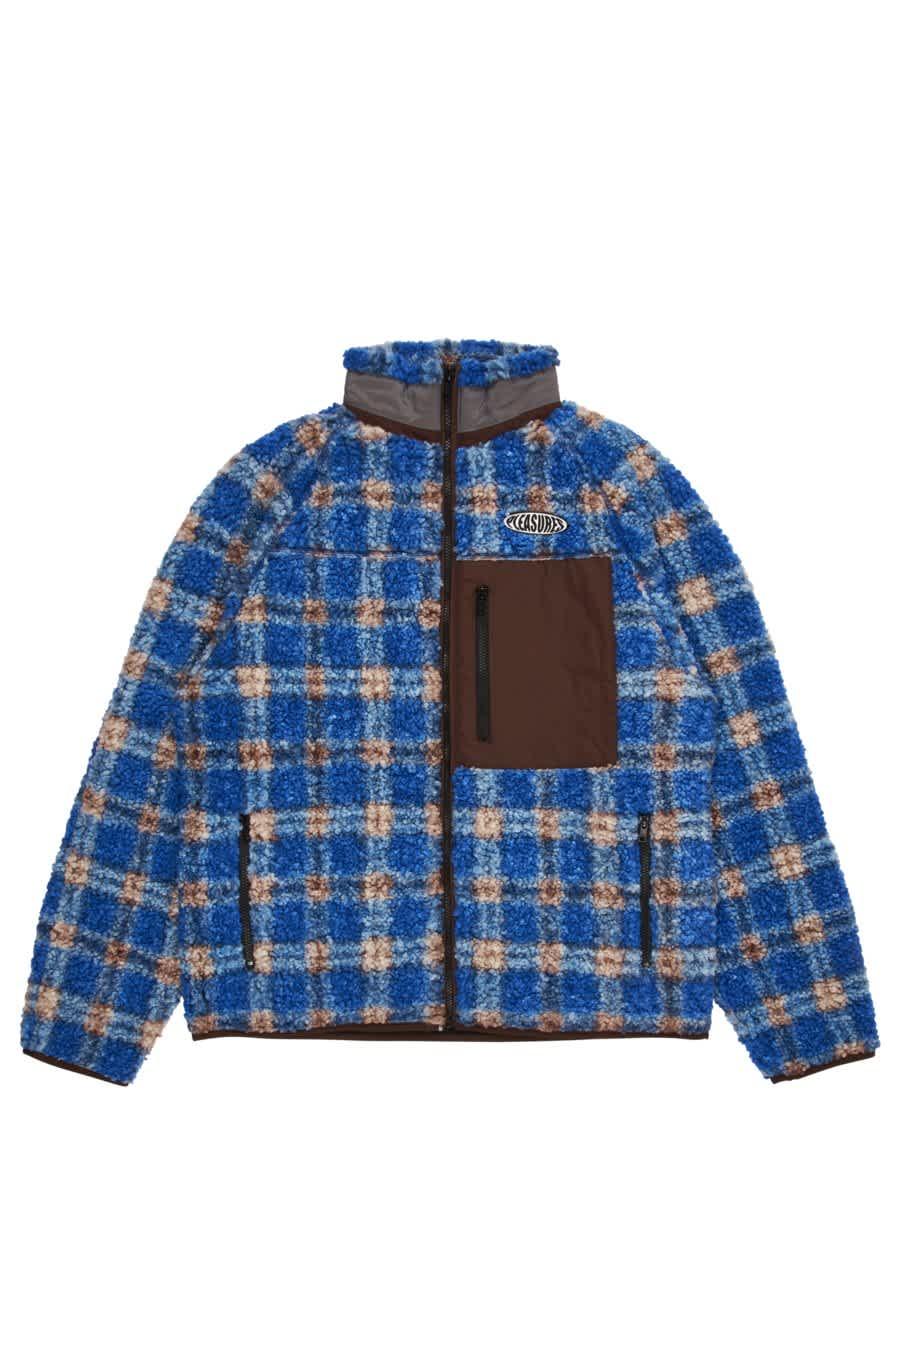 Blue Wraith Fleece Jacket   Jacket by Pleasures 1